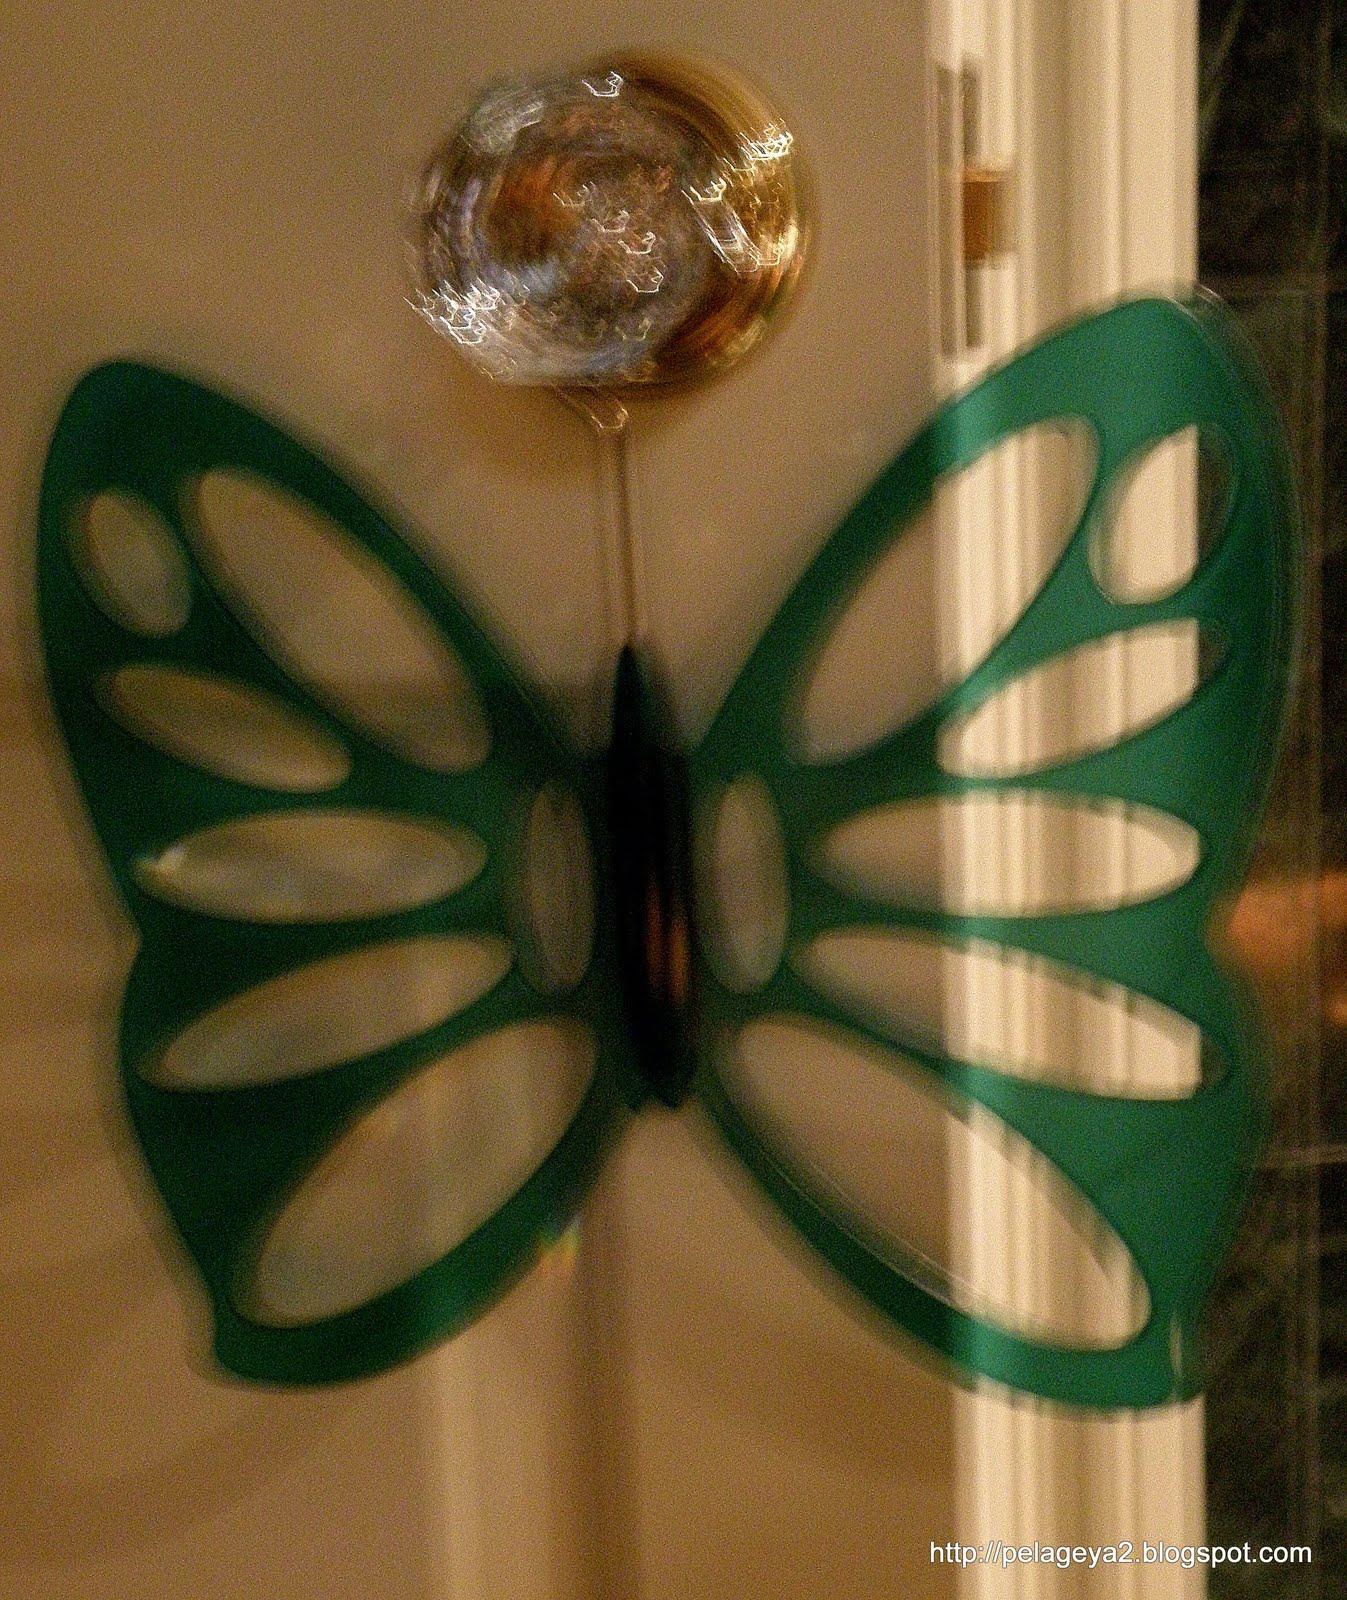 Pelageya: Амариллис, бабочка и кефир: http://pelageya2.blogspot.com/2011/01/blog-post_14.html